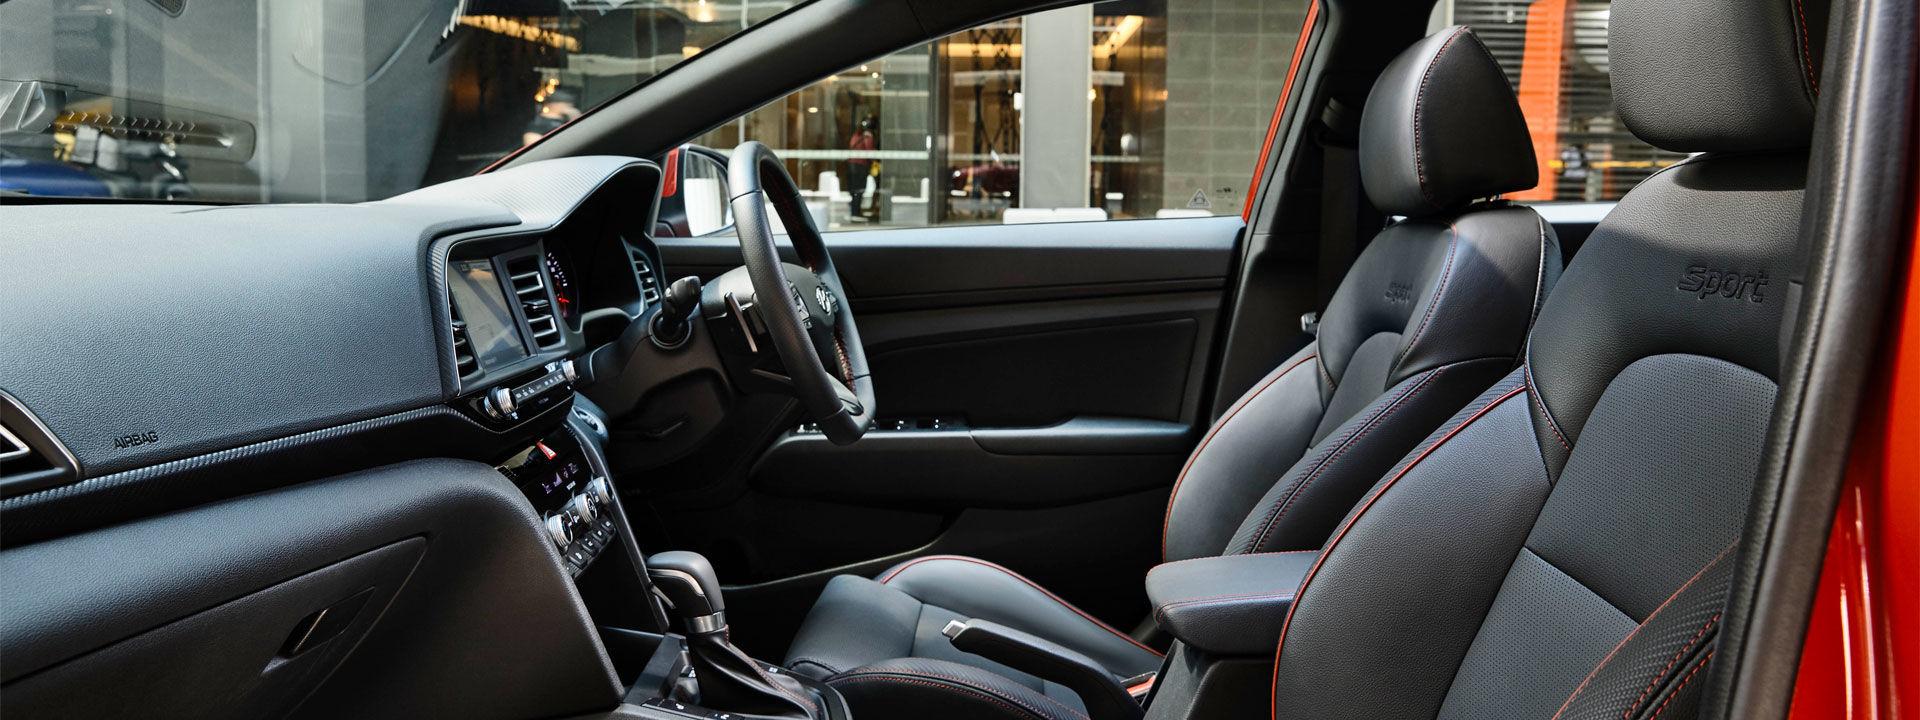 Elantra | Small Sedan Car | Hyundai Australia